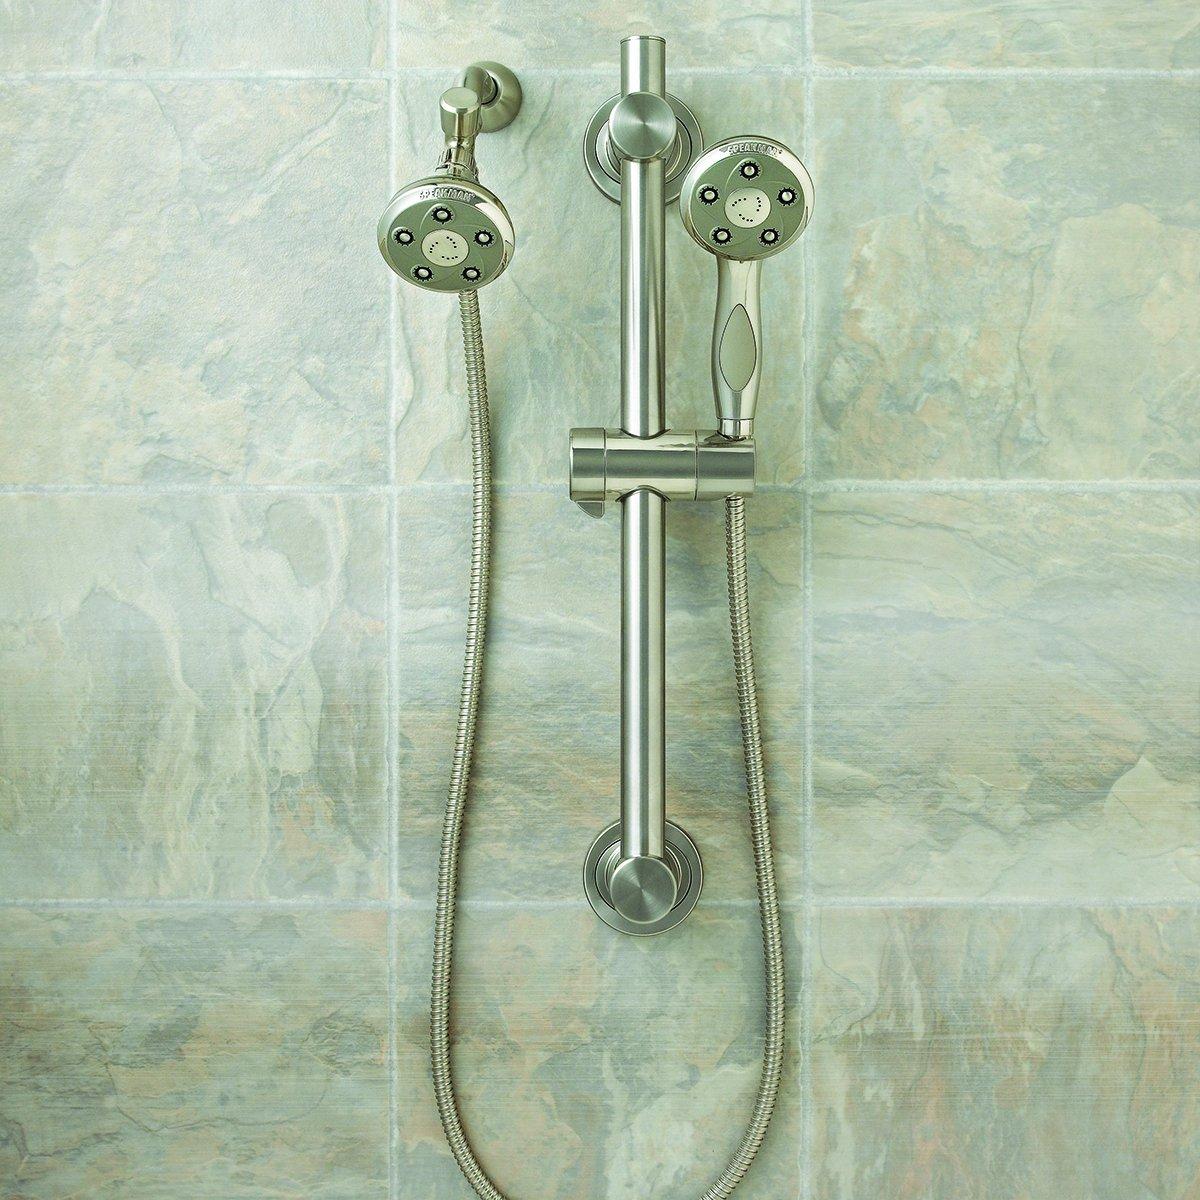 2.5 GPM Speakman VS-122007-BN Napa Anystream ADA Shower Combination Brushed Nickel